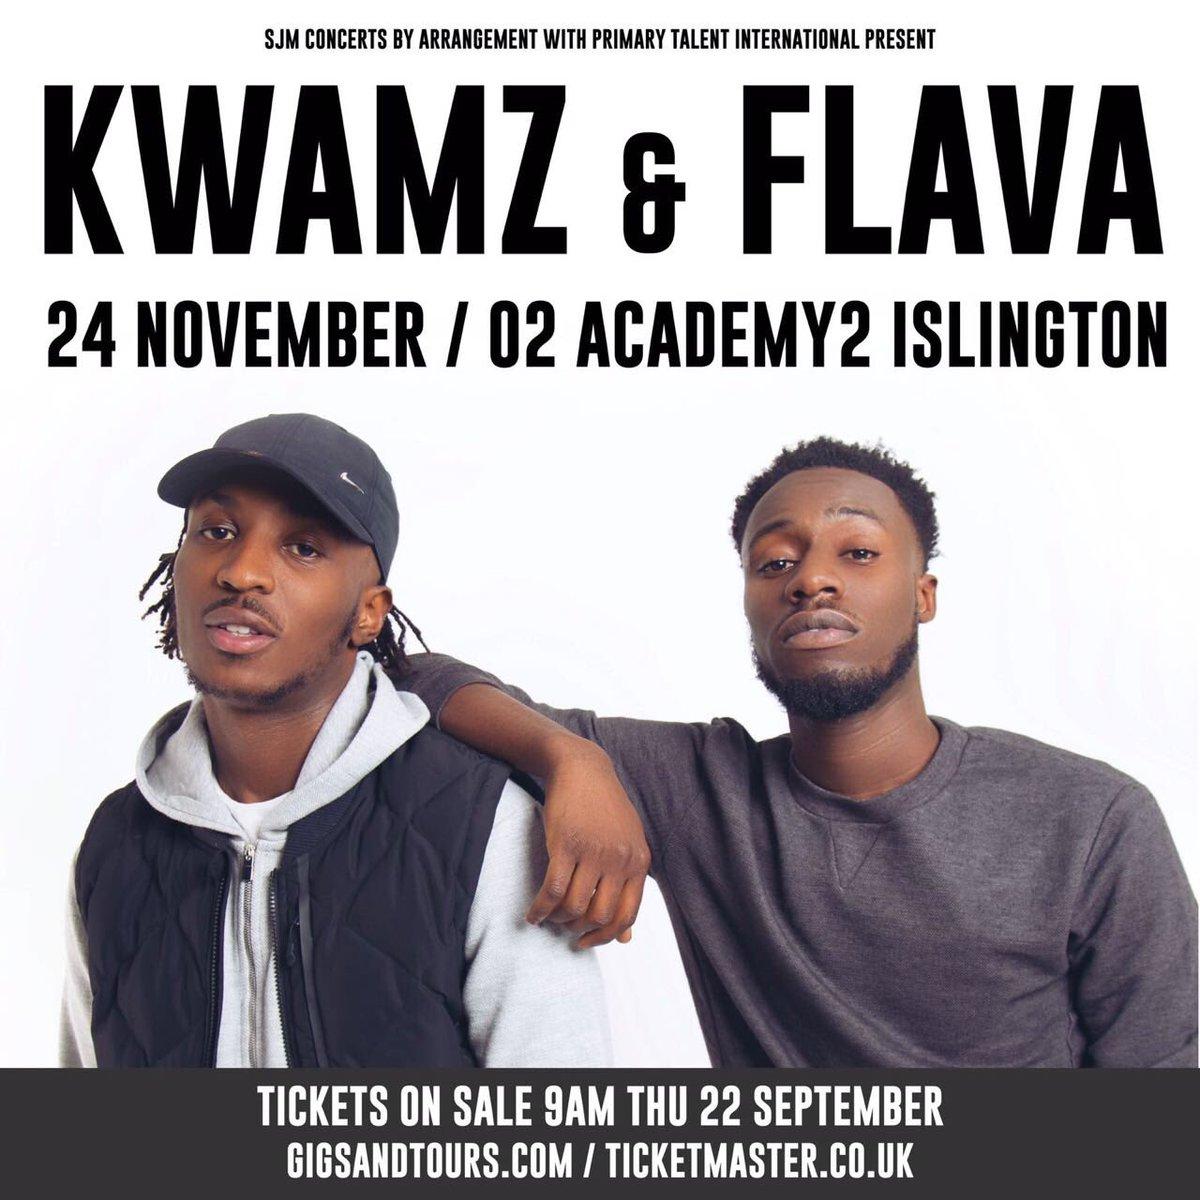 kwamz-flava-25-09-2016andrew